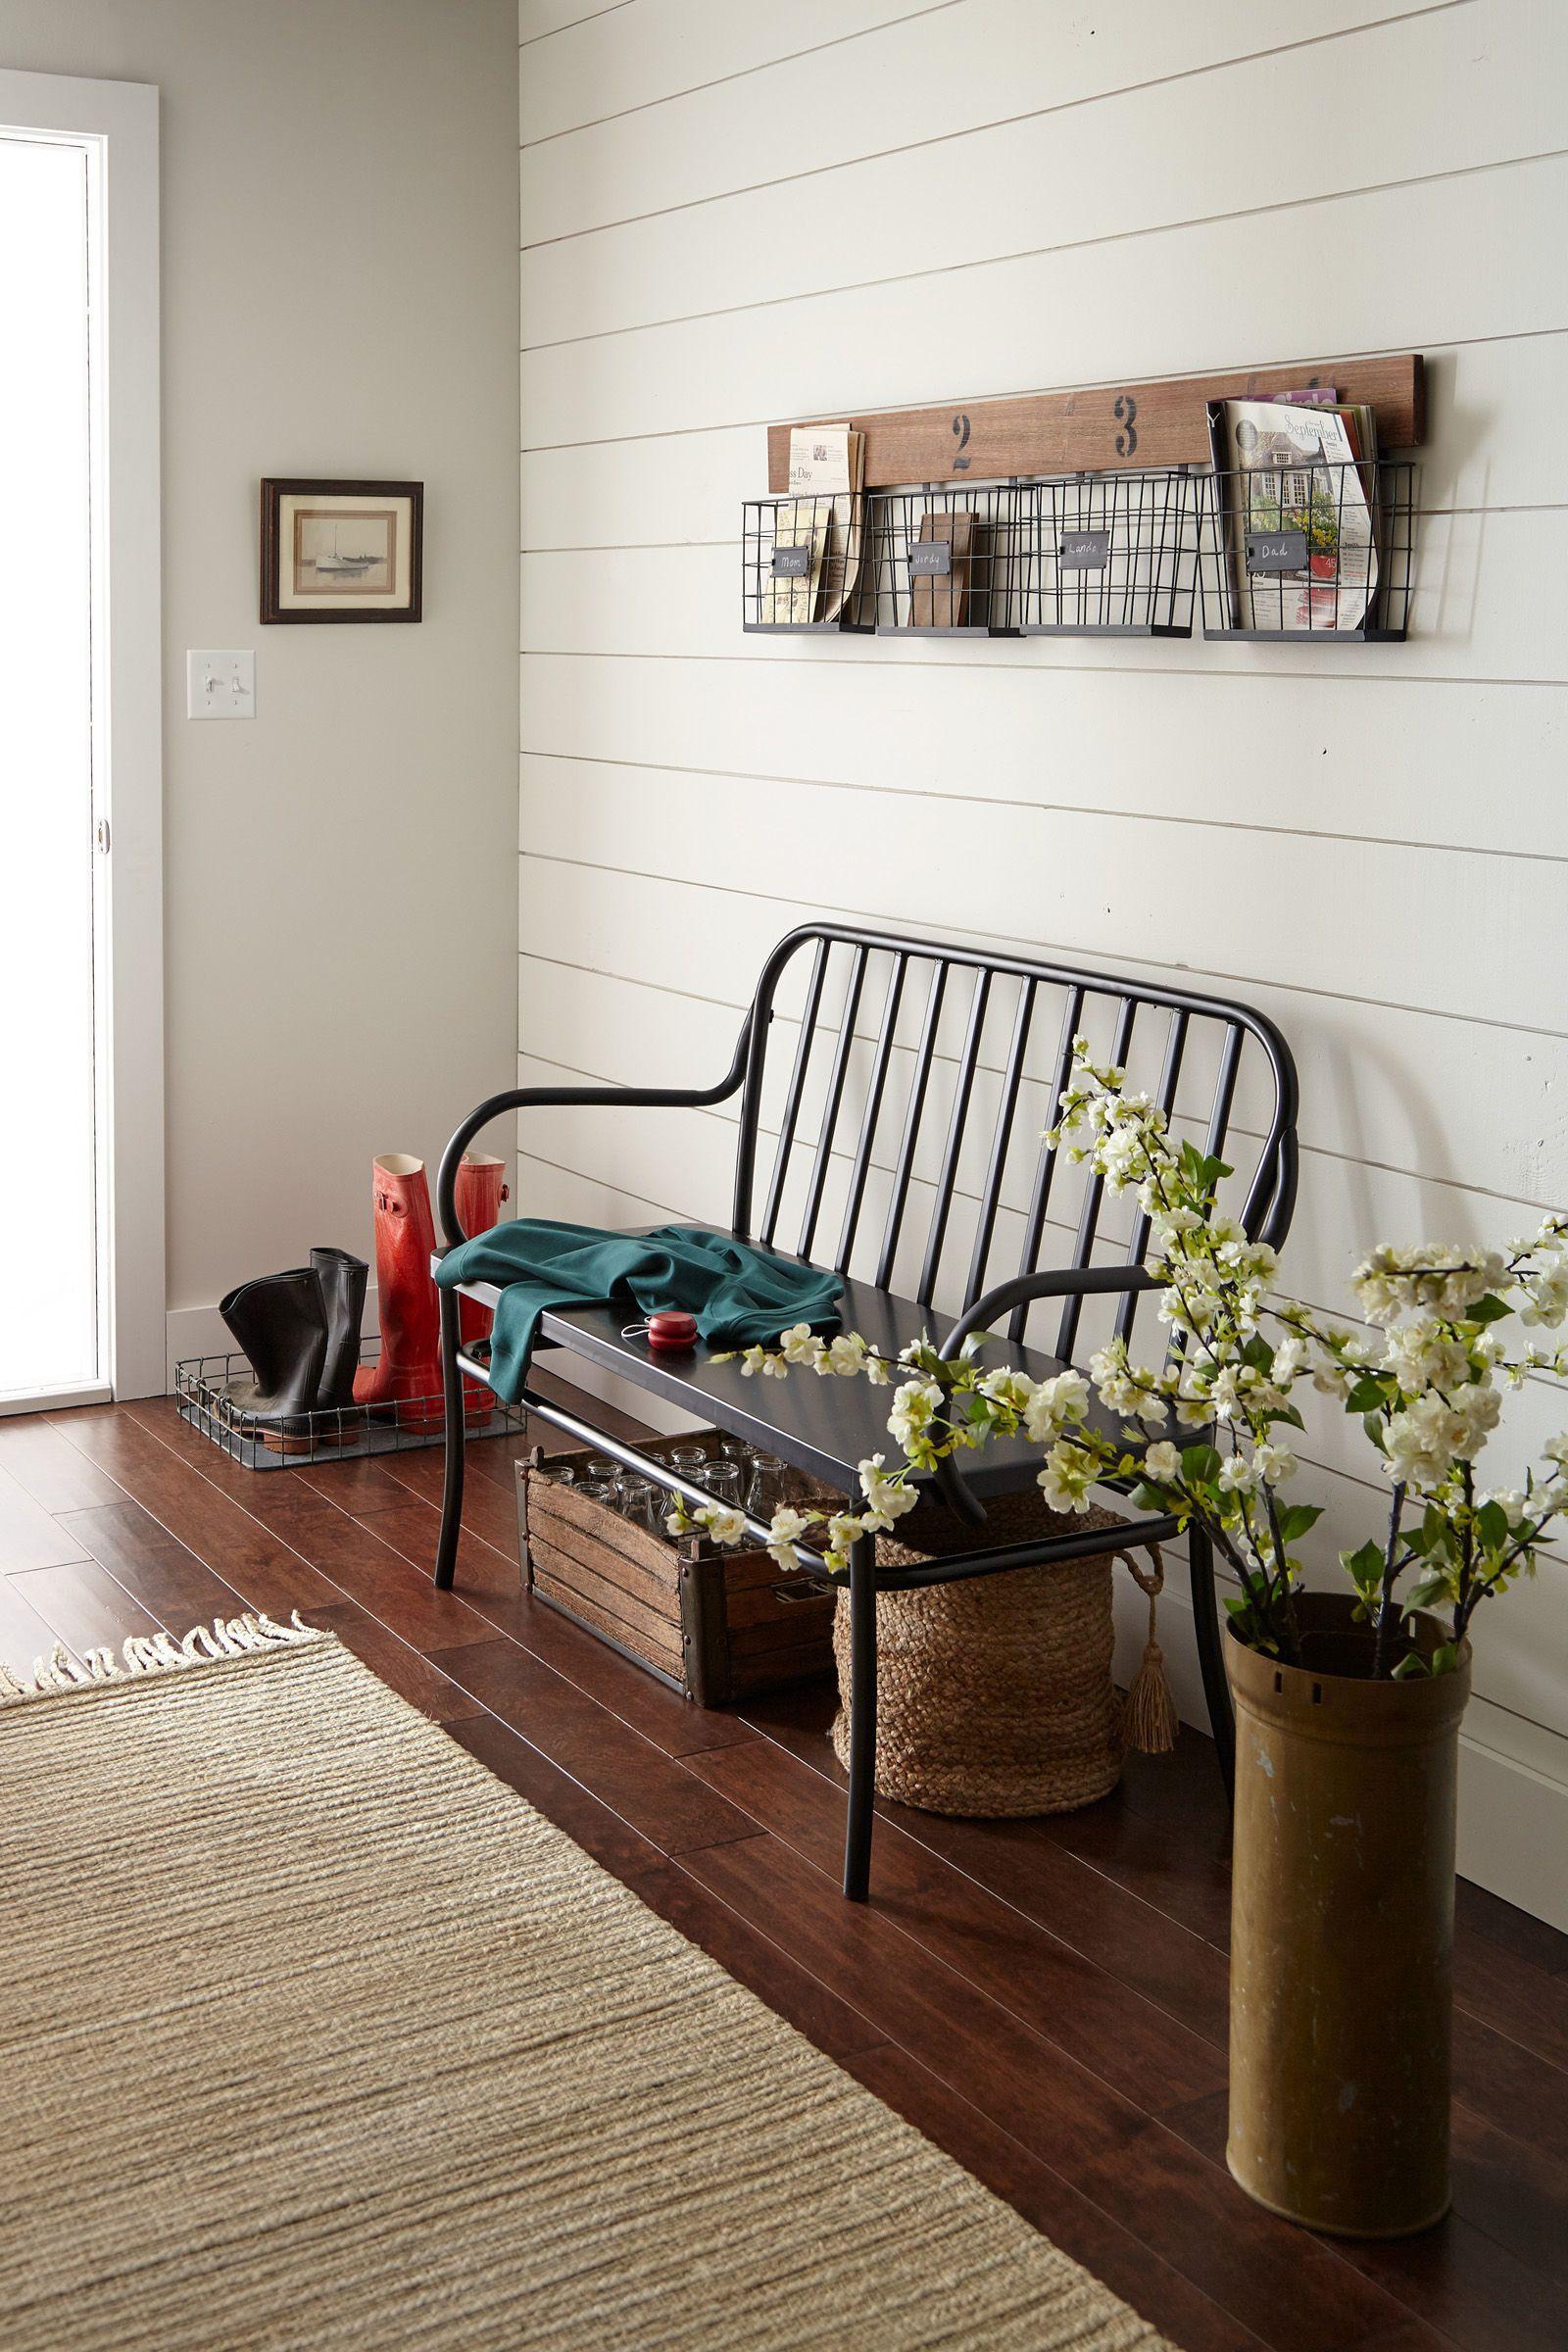 Joanna gaines hallway decor  Joanna Gaines Reveals Her  Favorite Paint Colors  Room Shiplap